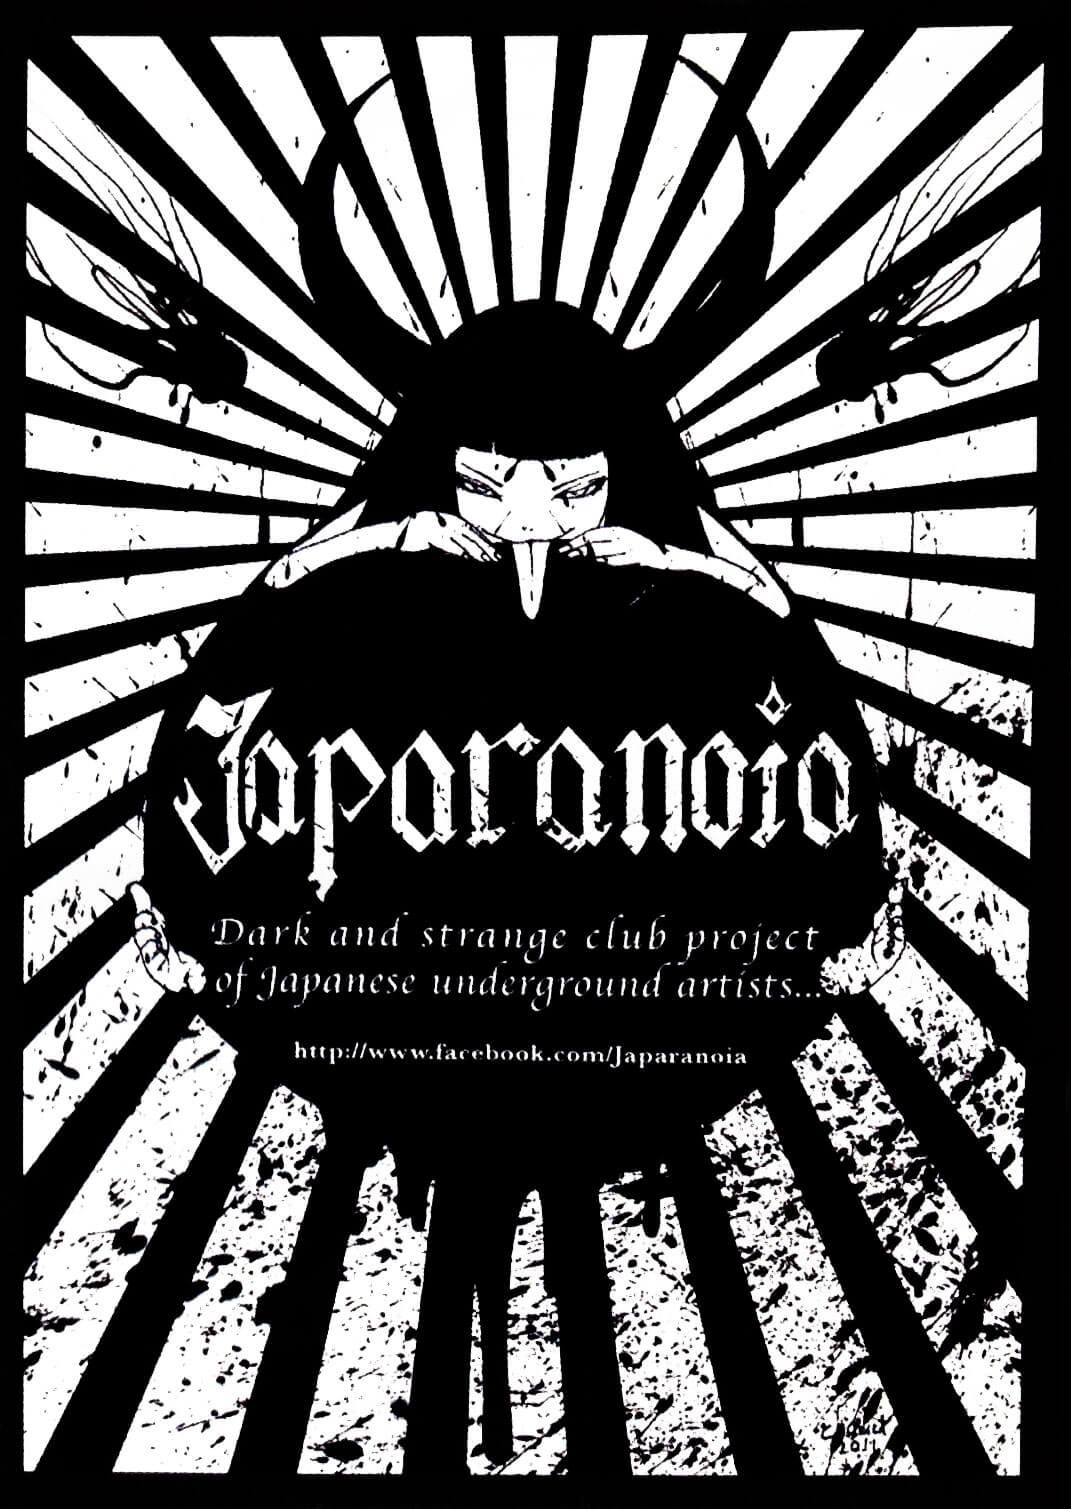 Japaranoia